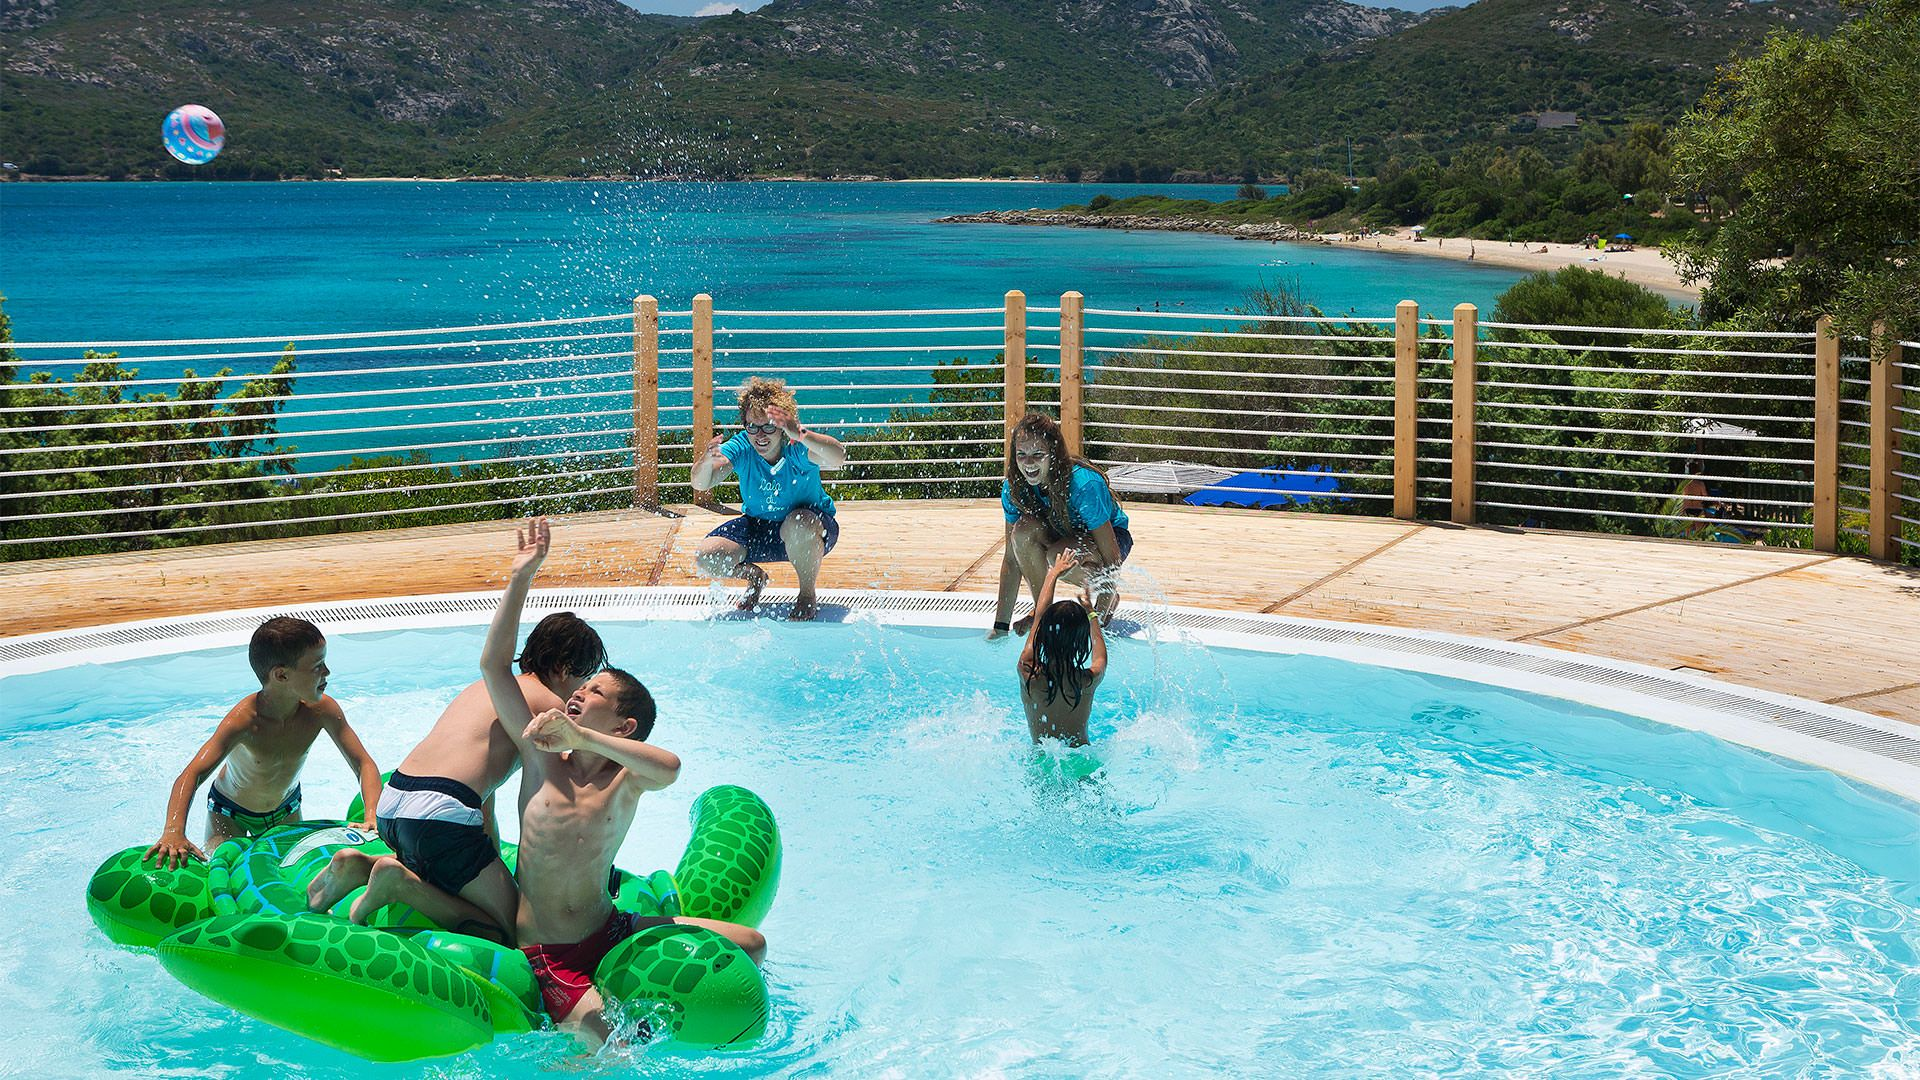 Delphina Un Hotel per famiglie a Palau Palau, Costa Smeralda Sardegna